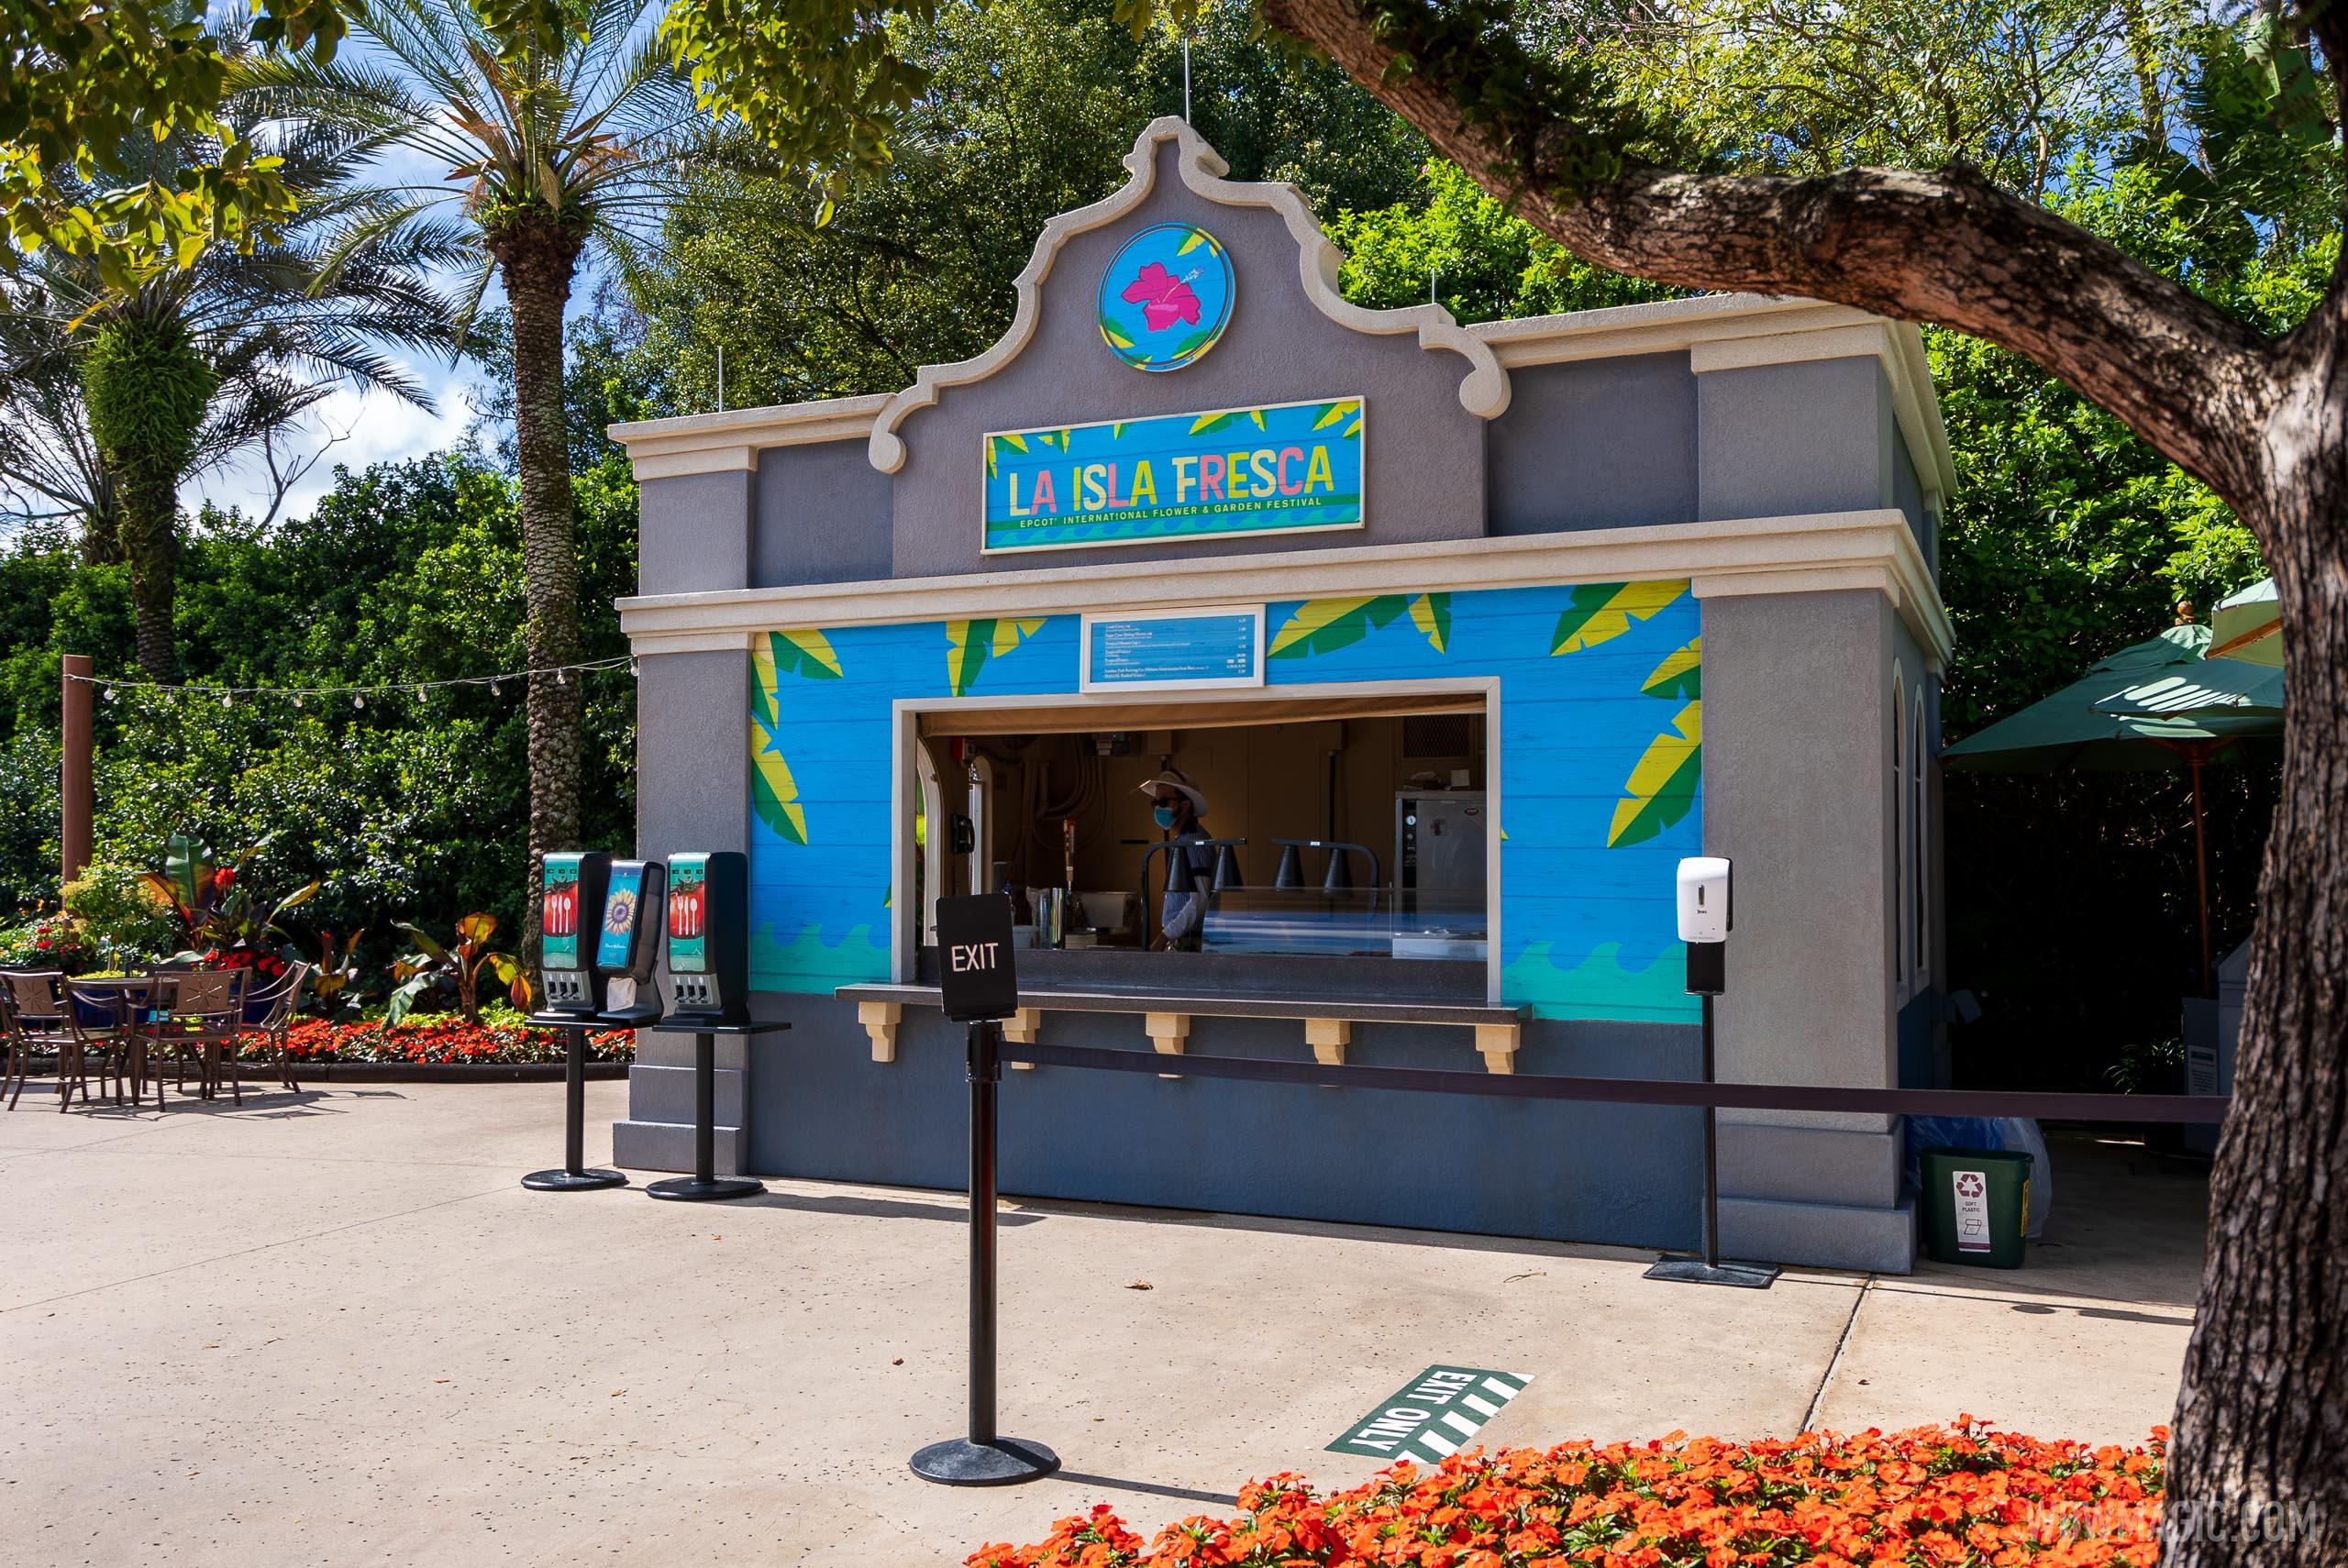 La Isla Fresca kiosk